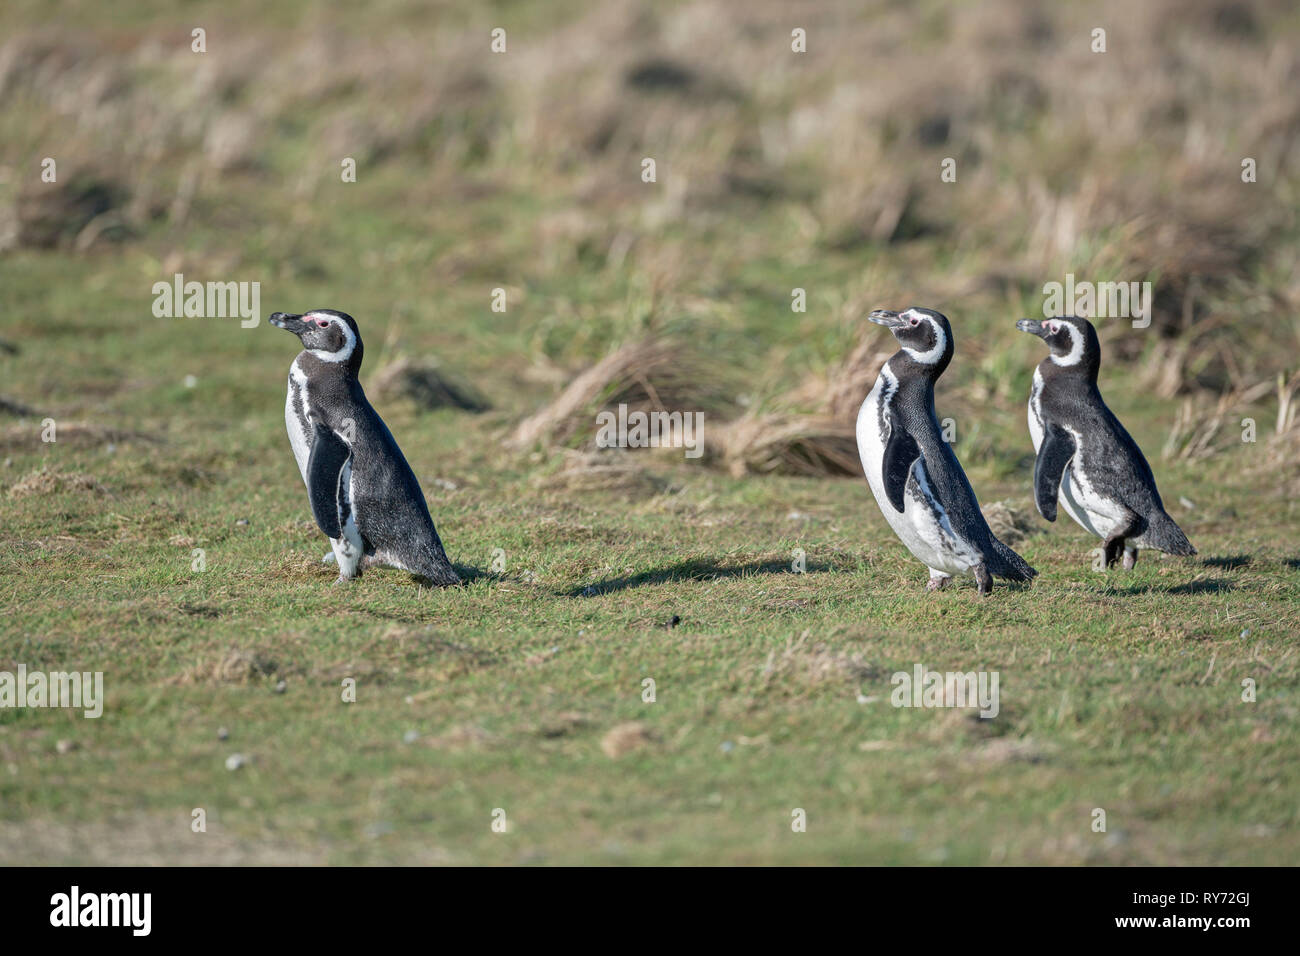 Magellanic penguins, Falkland Islands, South Atlantic, South America - Stock Image